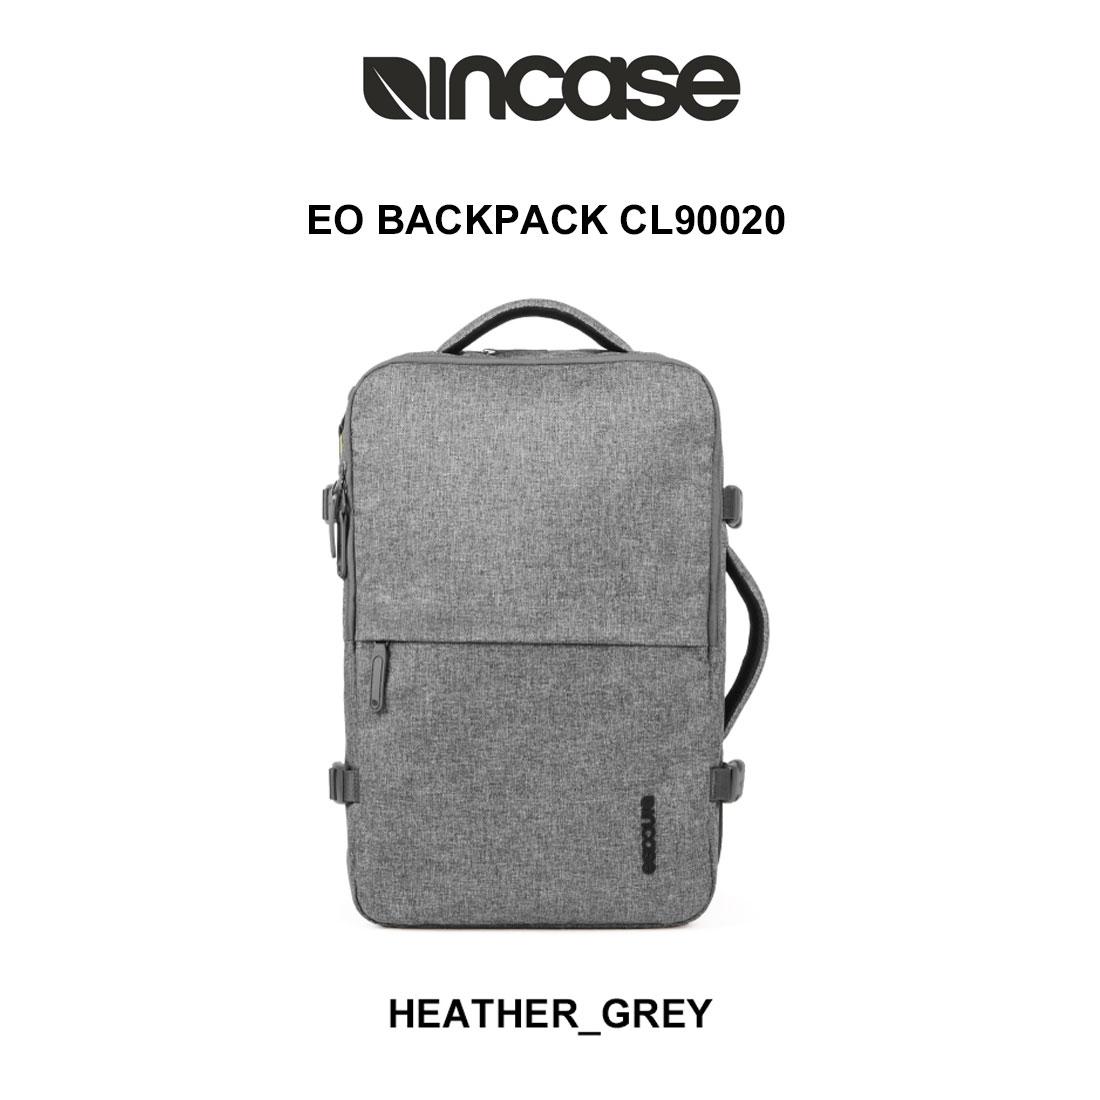 Incase(インケース)トラベル 旅行 バックパック リュック EO BACKPACK CL90020 Heather Gray